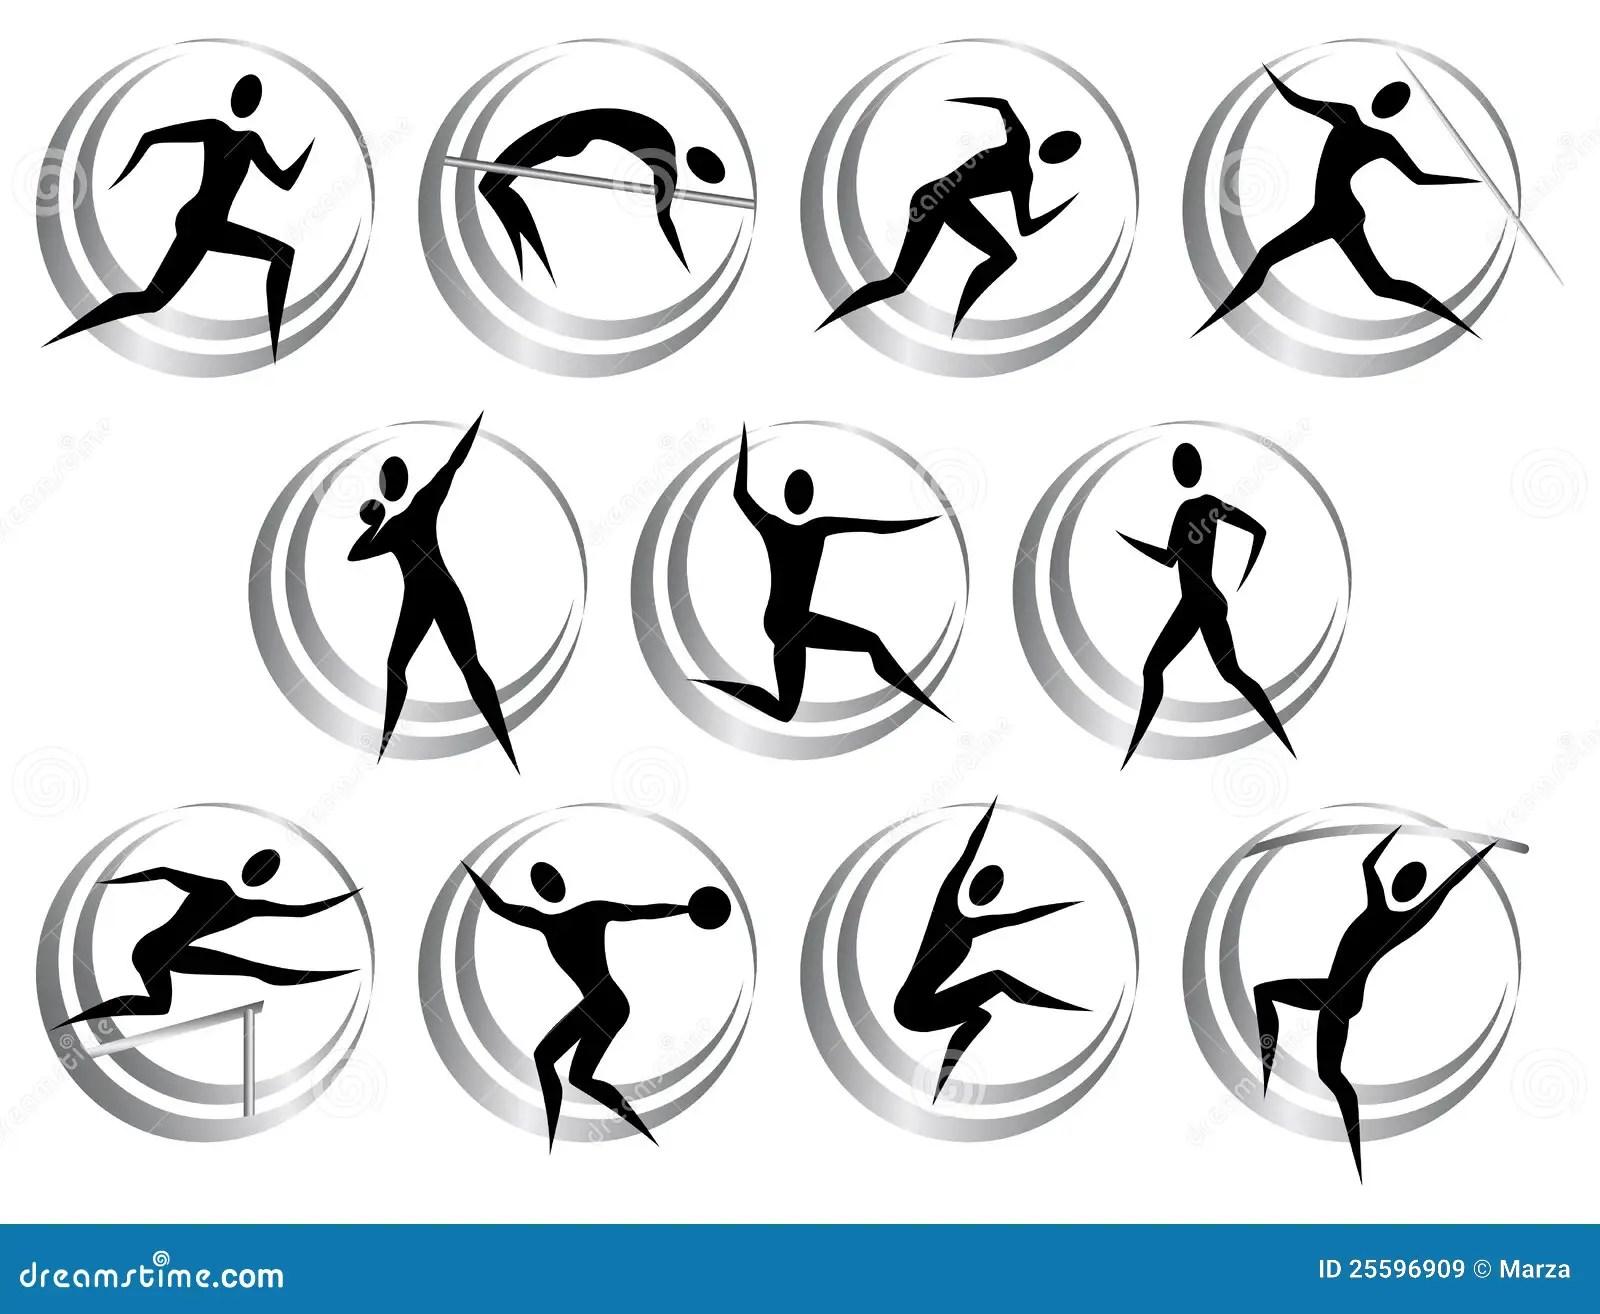 Athletics Symbols Royalty Free Stock Images